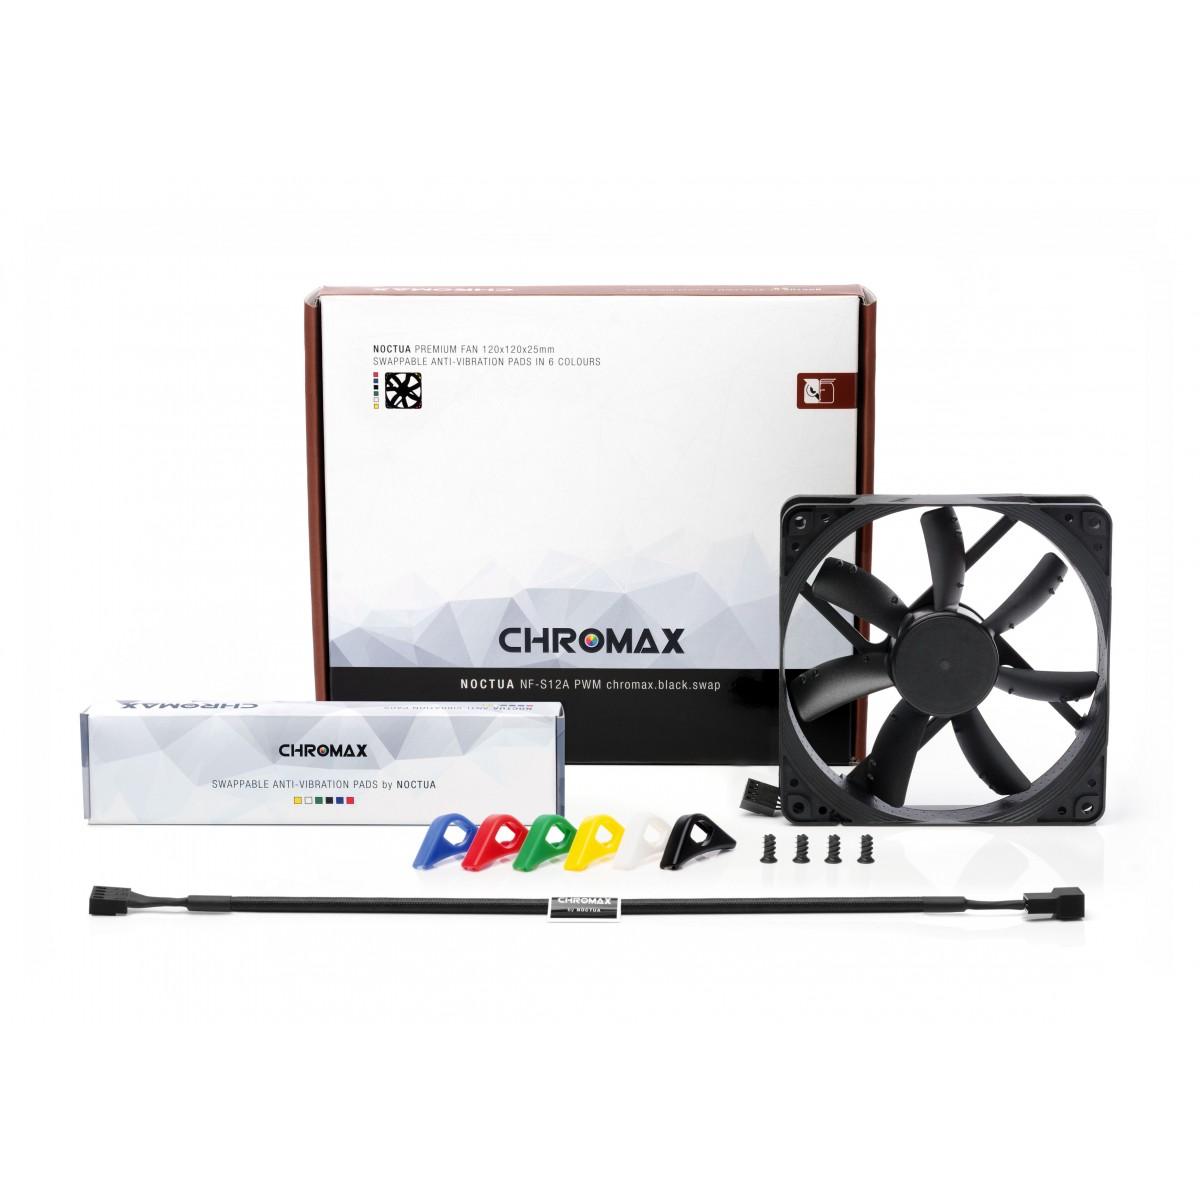 Cooler para Gabinete Noctua NF-S12A PWM chromax.black.swap, Black, 120mm, NF-S12A PWM chromax.black.swap